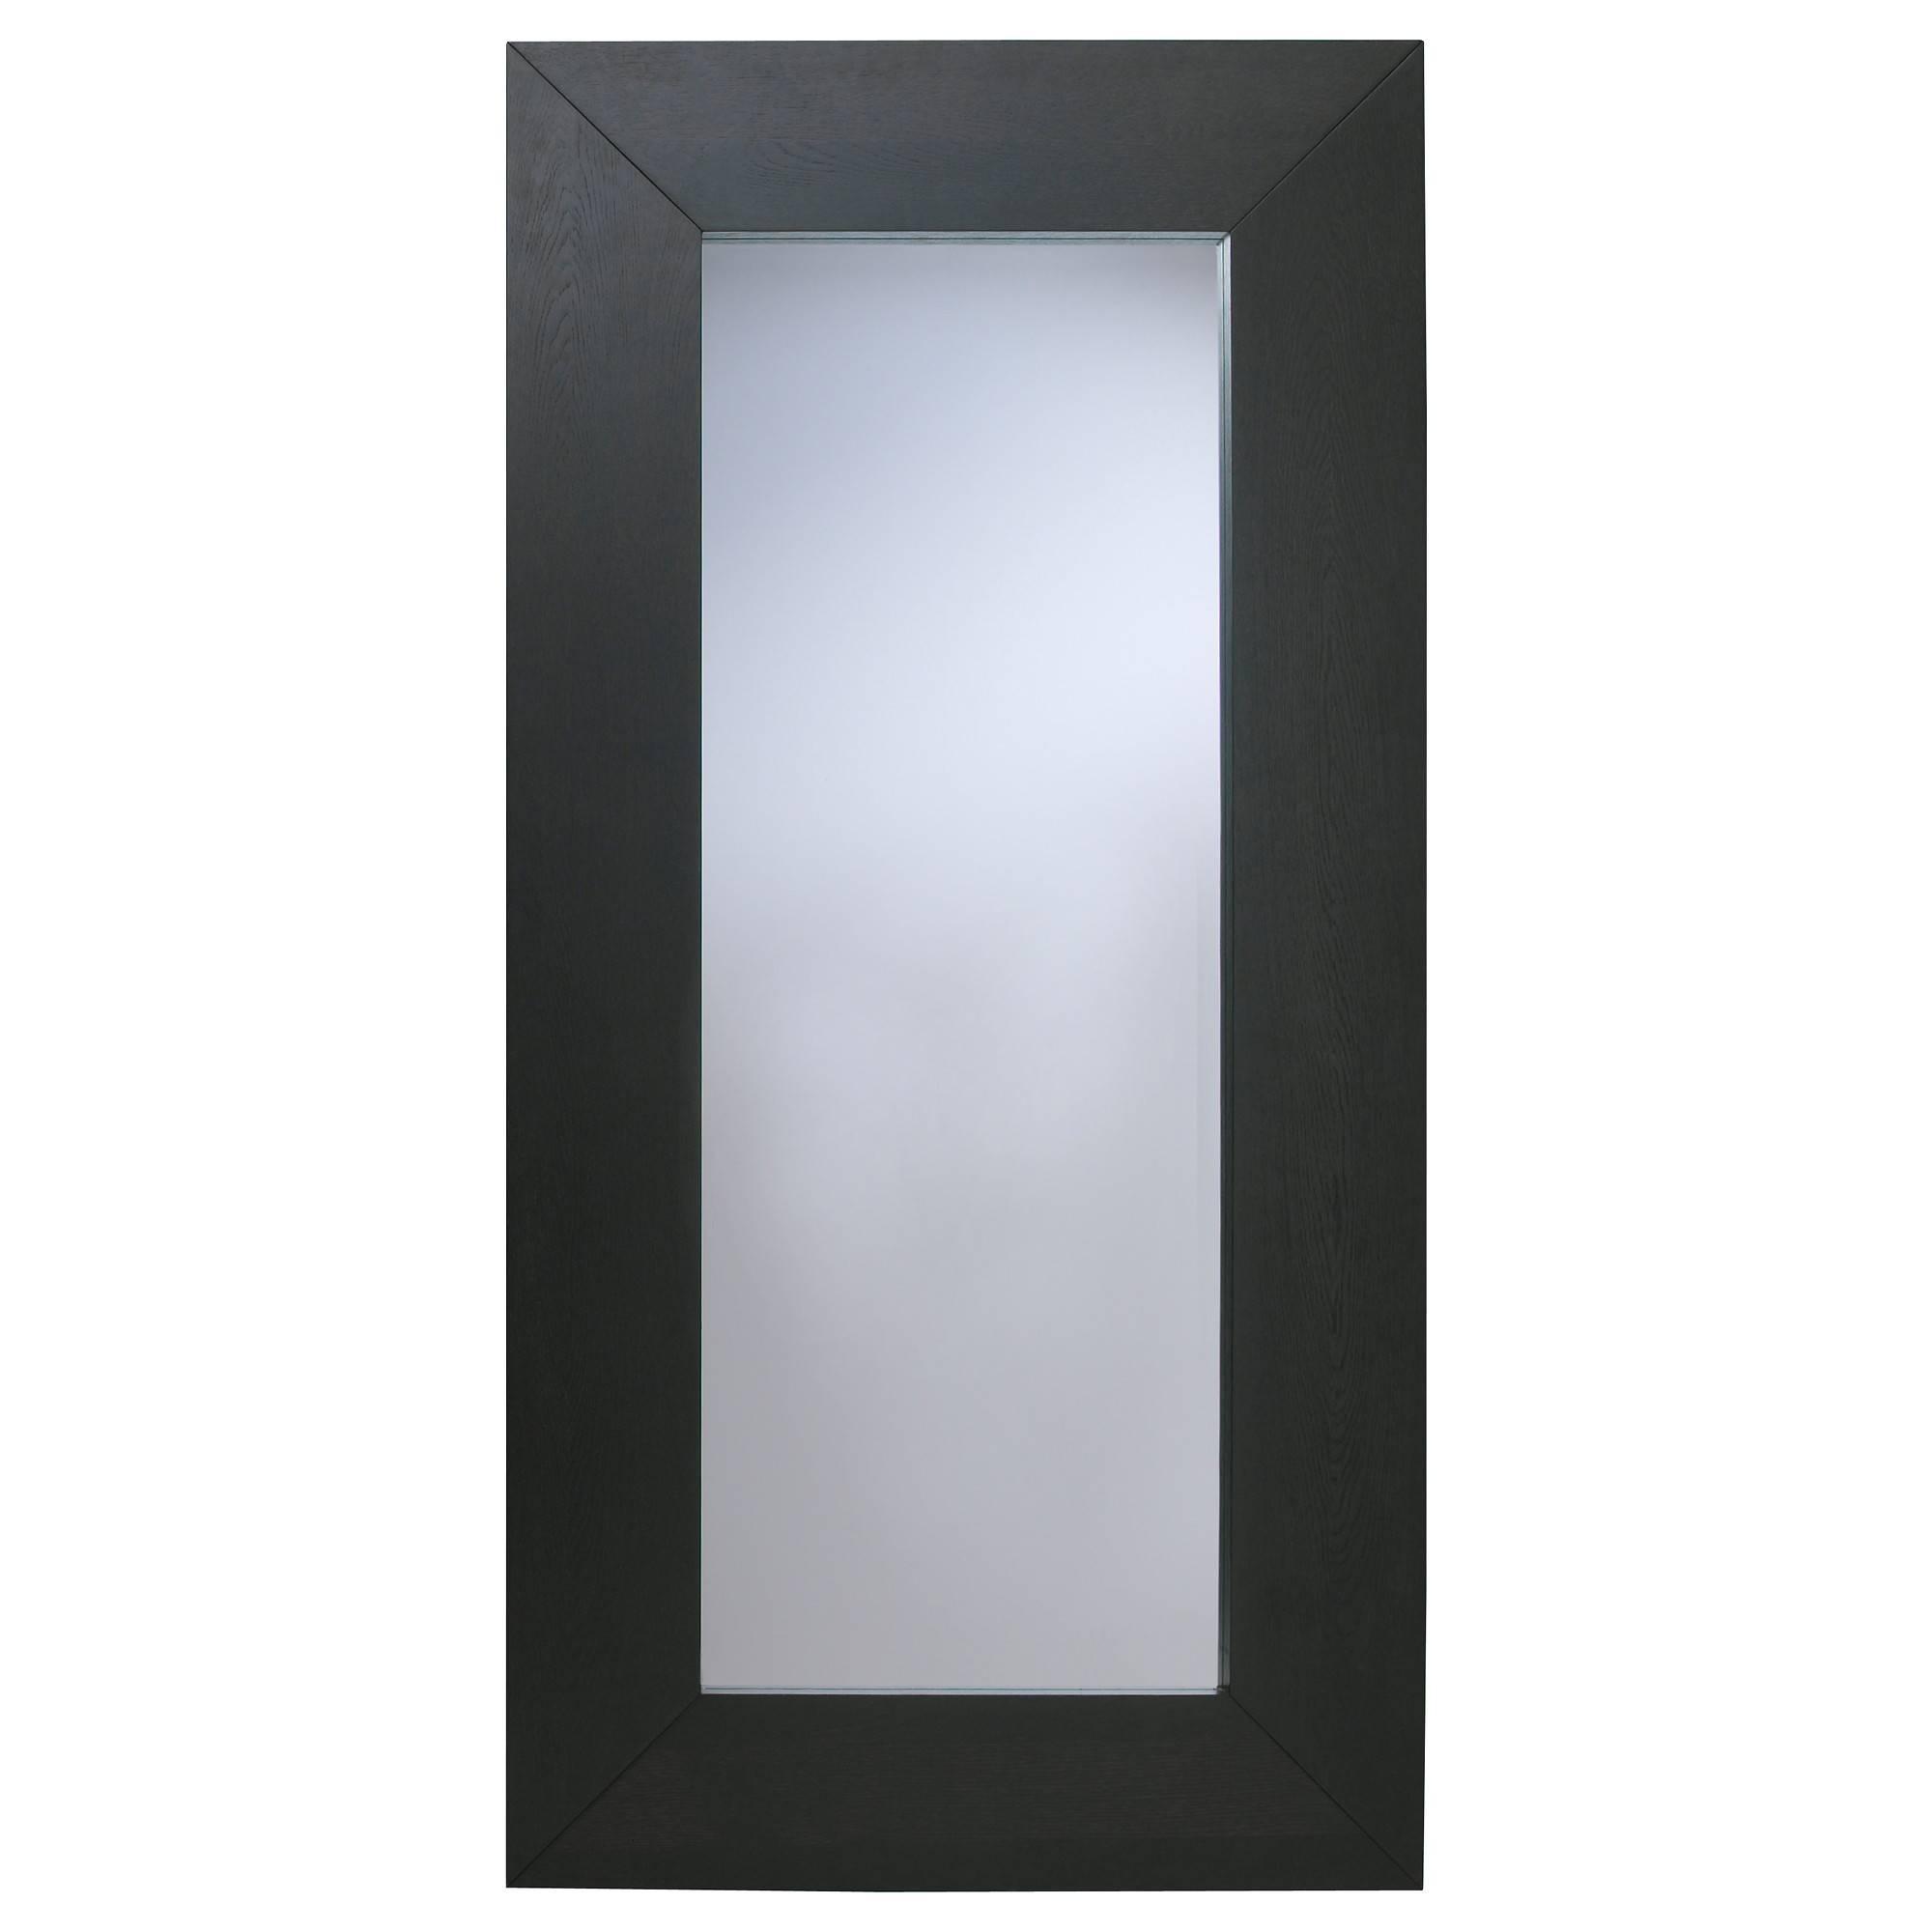 Mongstad Mirror Black Brown 94X190 Cm – Ikea Regarding Black Mirrors (View 8 of 15)